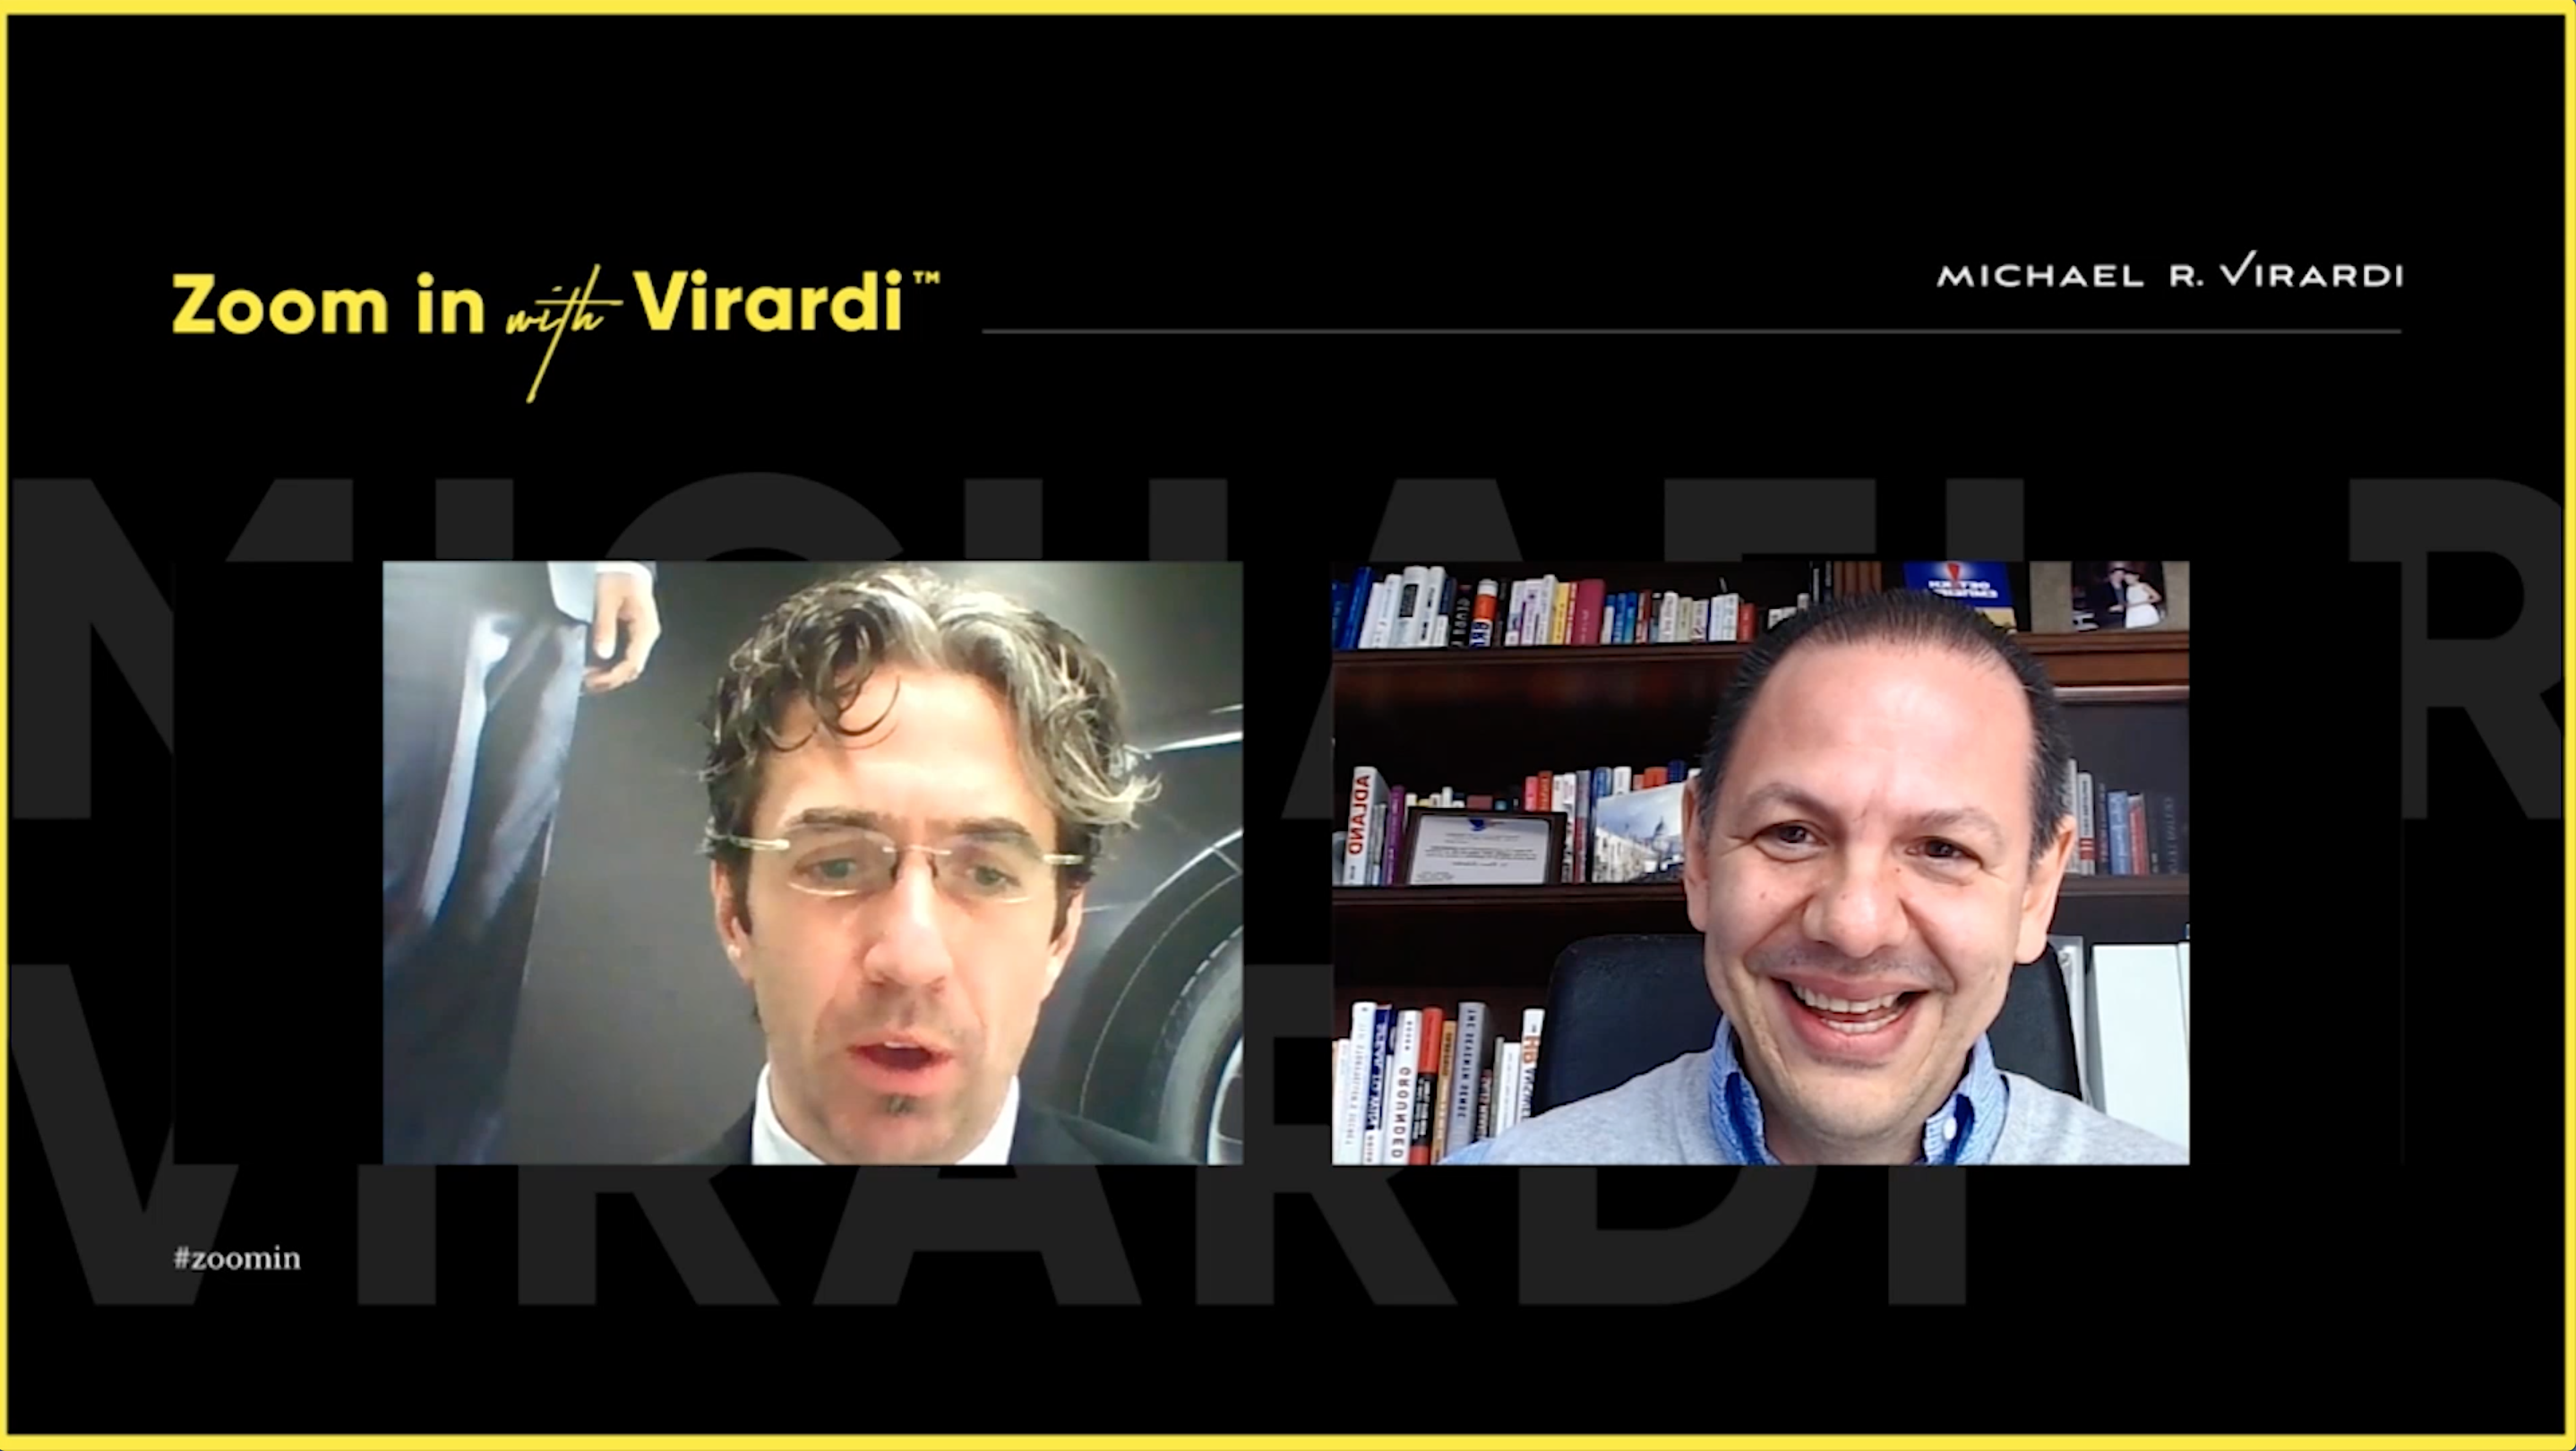 Michael Virardi - ZOOM IN with VIRARDI™   Felice Valente   Pirelli   Episode 1